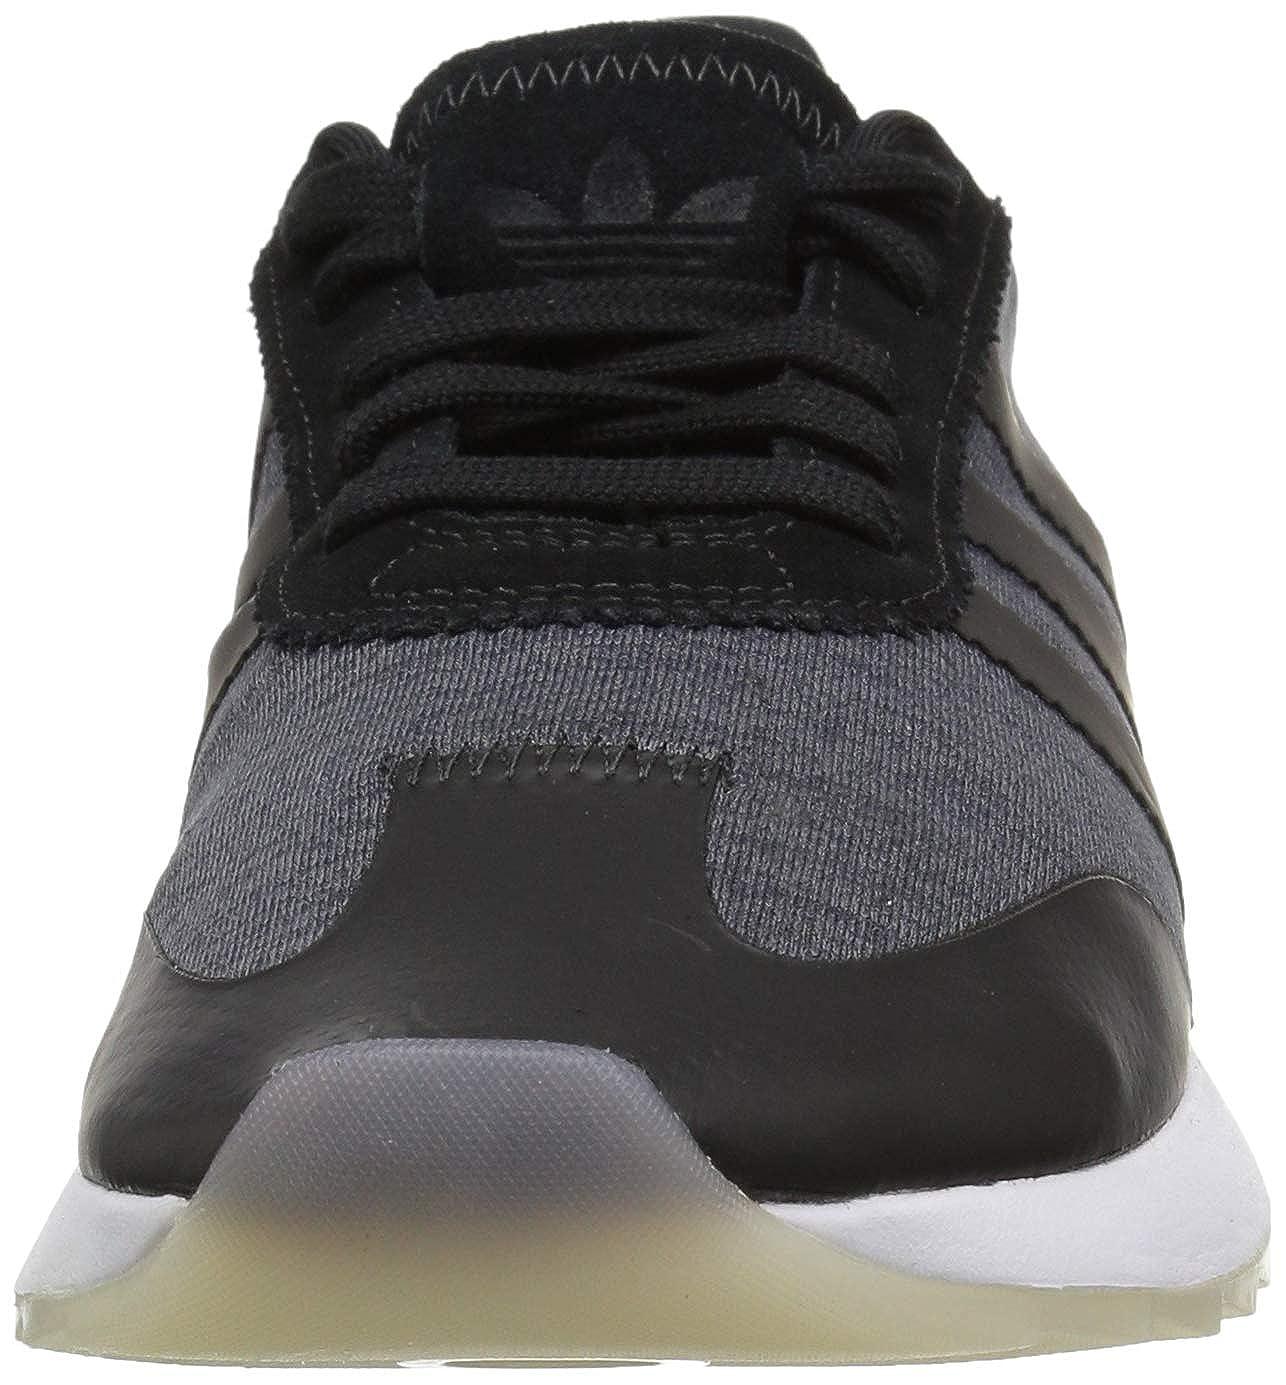 huge discount 78622 55b24 Nike Mens Air Force 1 Low Premium ACG Wildwood OG Lighting 318775-071 Size  9.5,